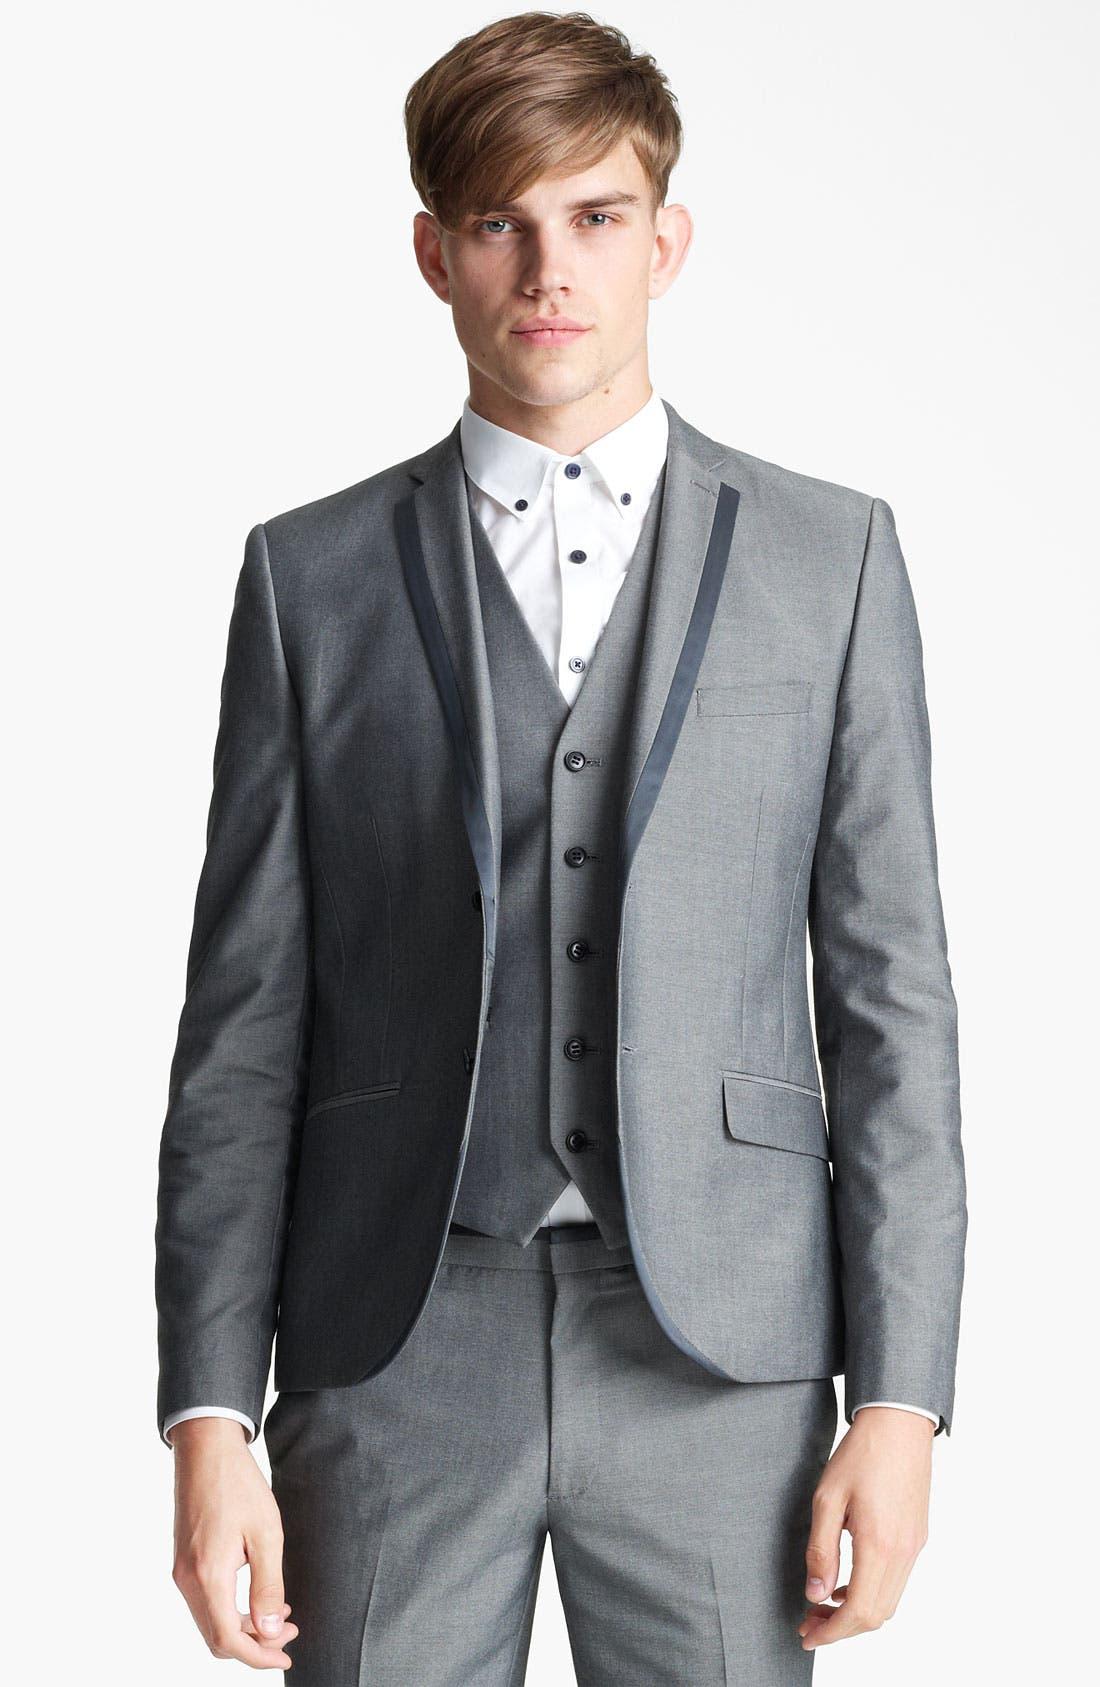 Alternate Image 1 Selected - Topman 'Nottingham' Skinny Suit Jacket